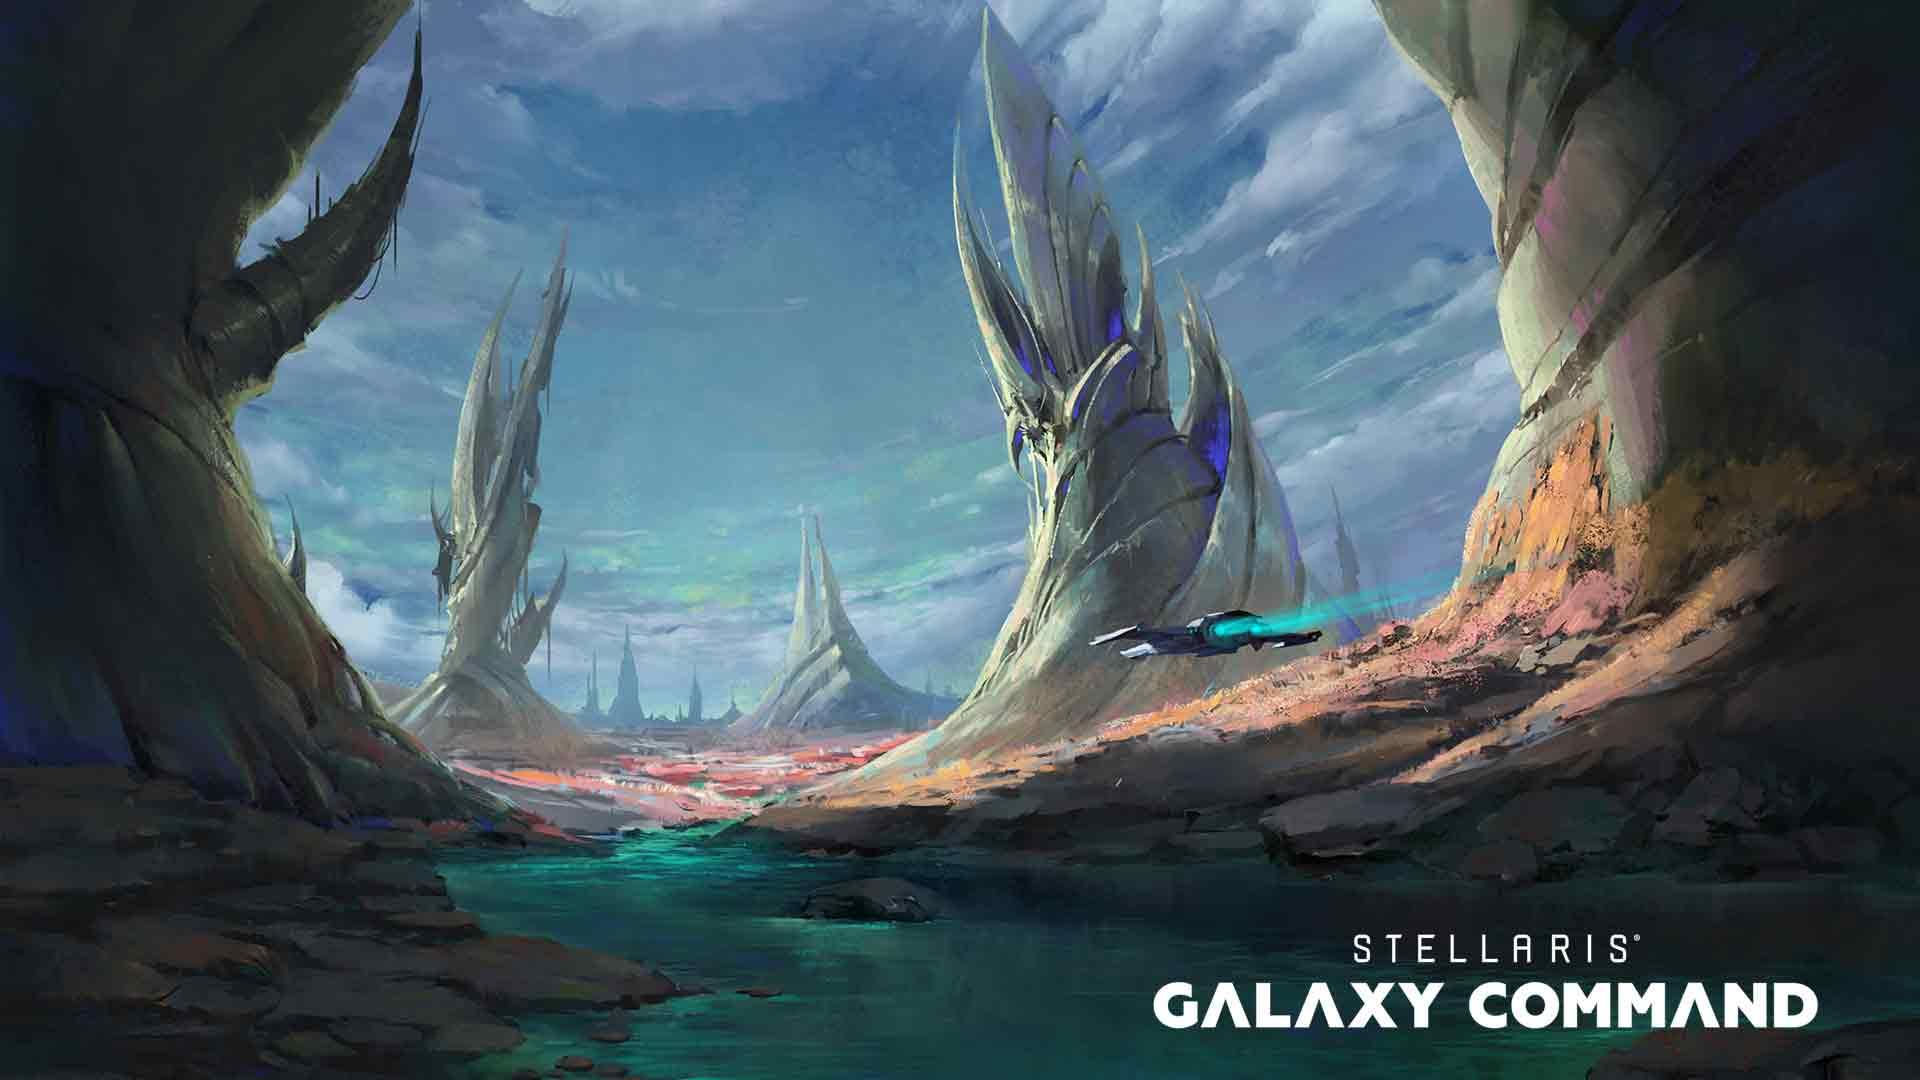 Stellaris-ไทย-เกมสำรวจจักรวาล2